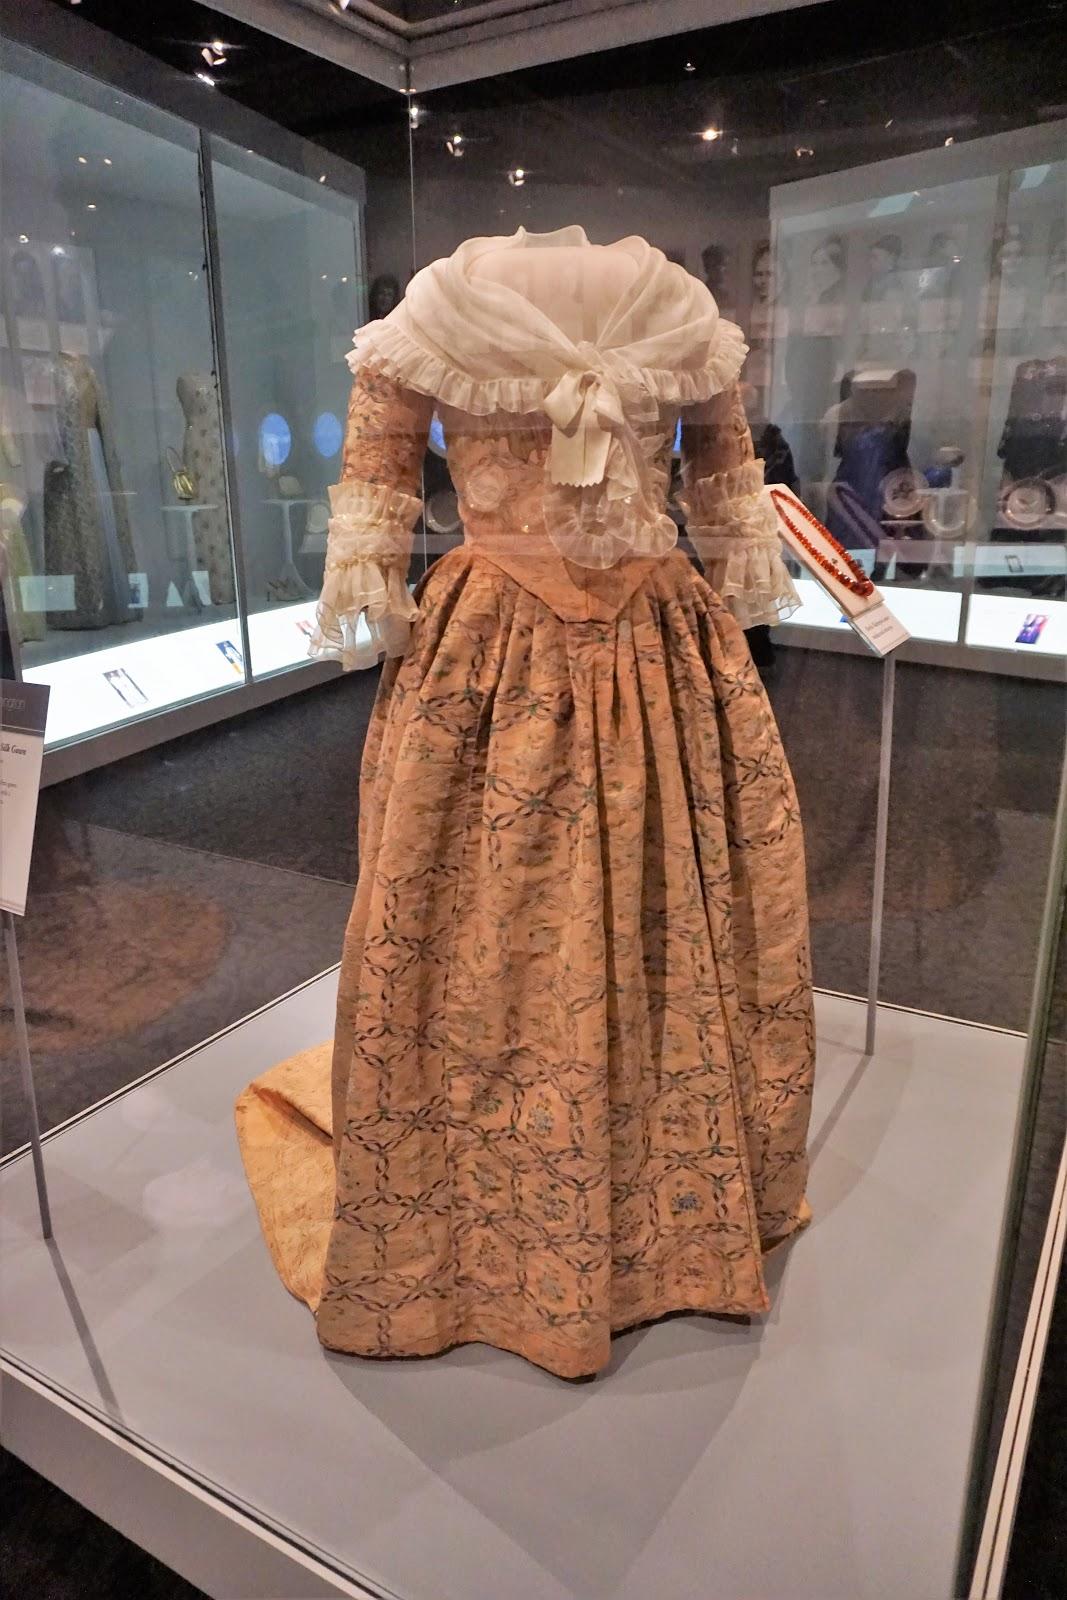 Delco Daily Top Ten: Washington D.C. First Lady Fashions through History